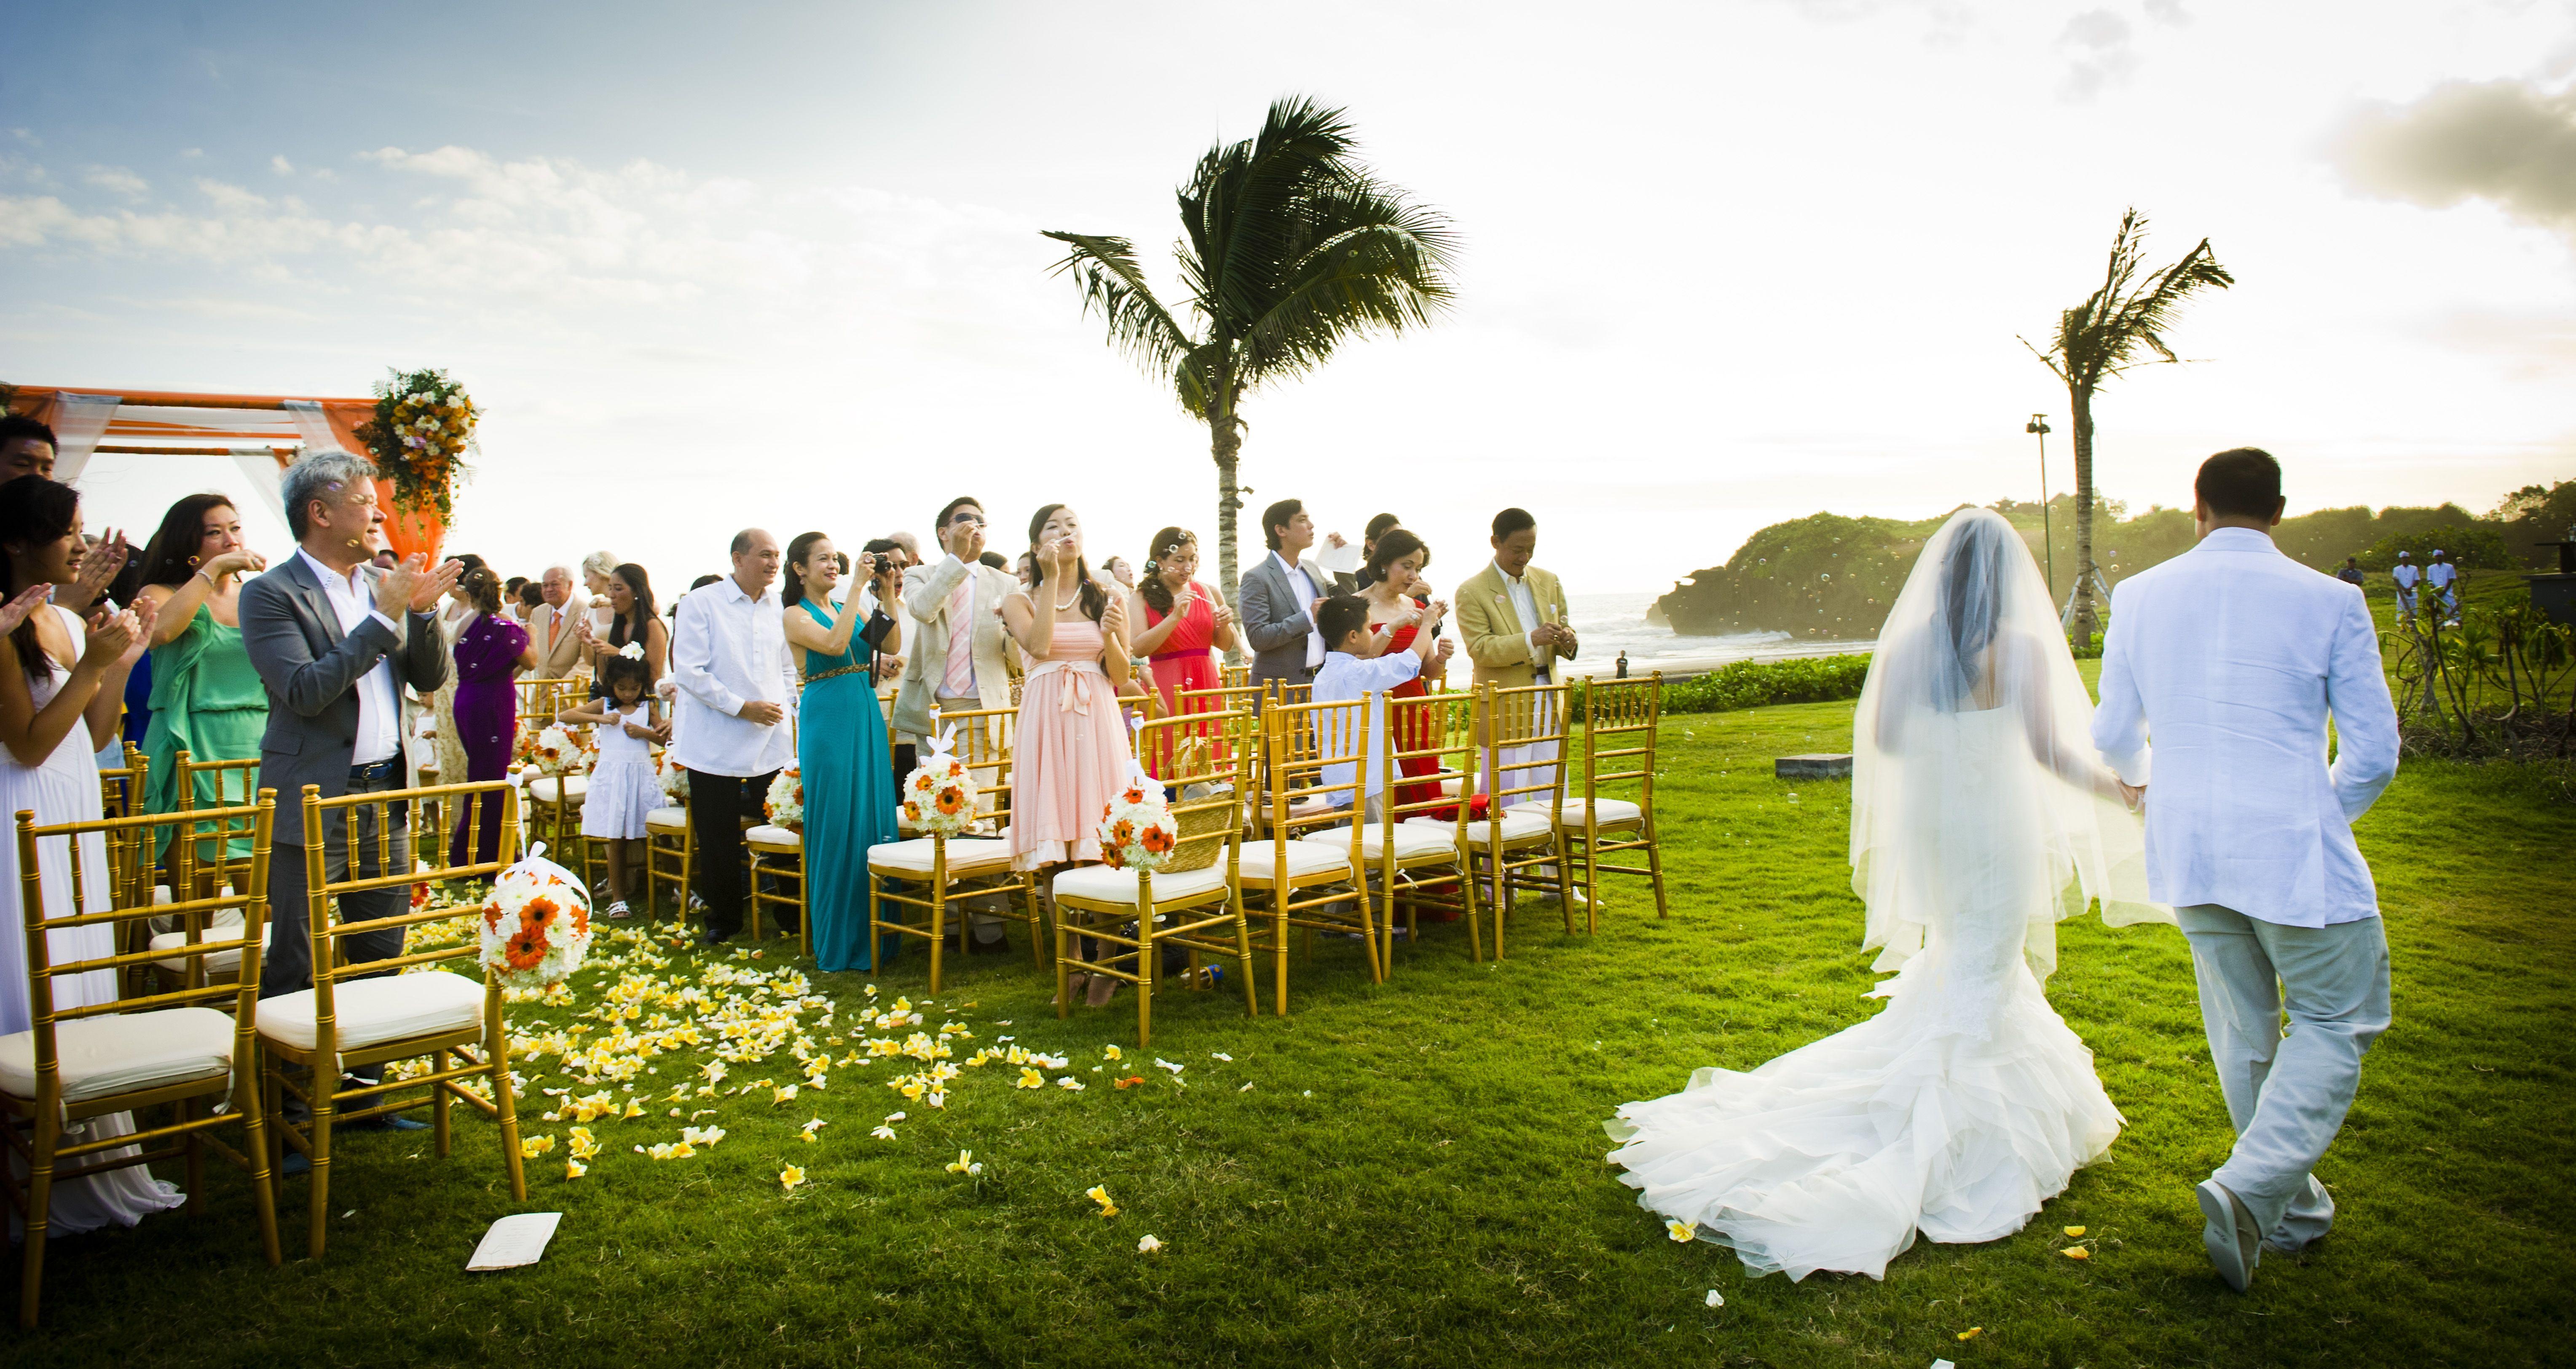 A joyfully colorful wedding #colorful #wedding #couple #beautiful #bride #groom #beachwedding #beach #bali #indonesia #alilavillassoori #alilahotels